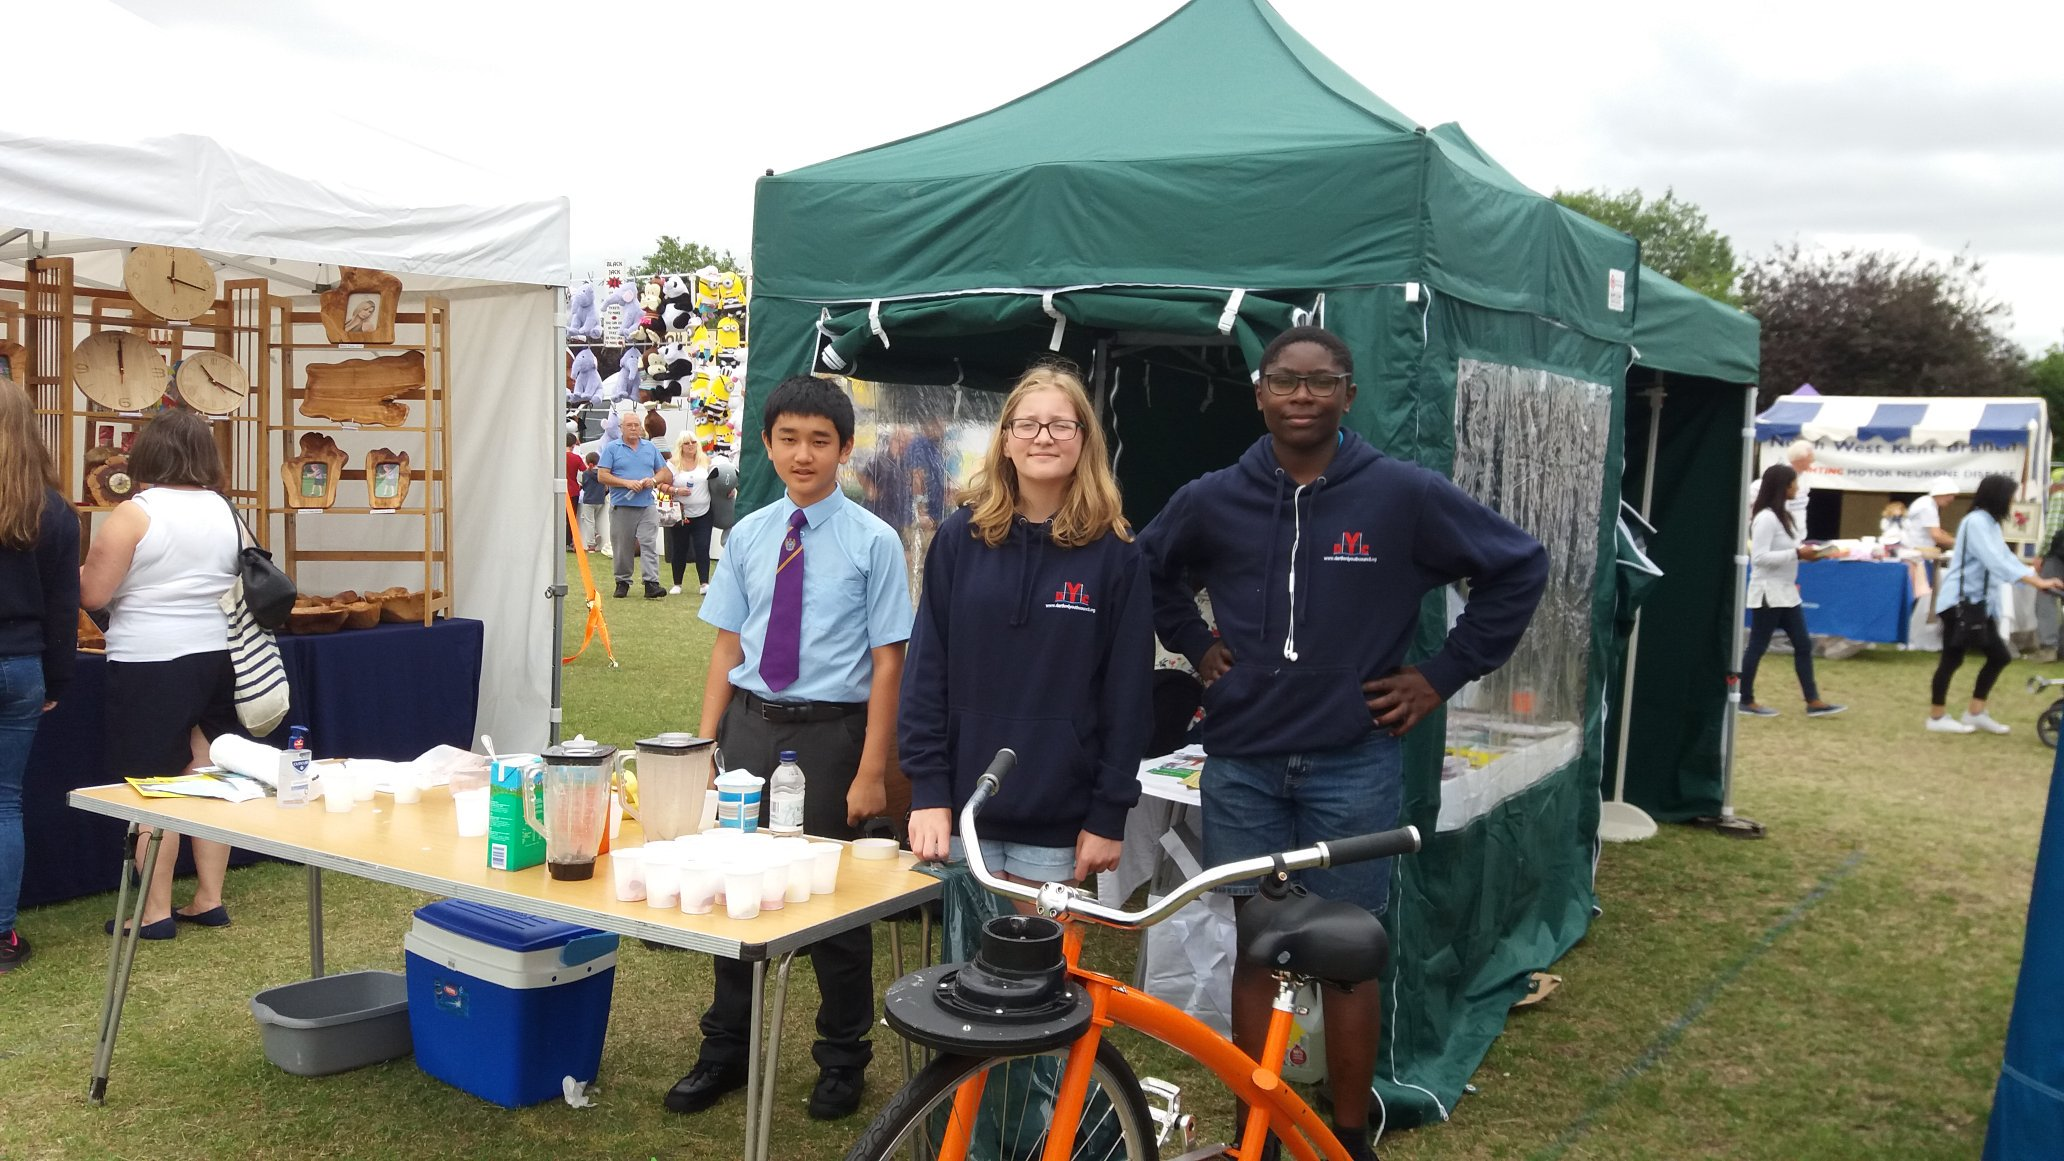 Dartford festival